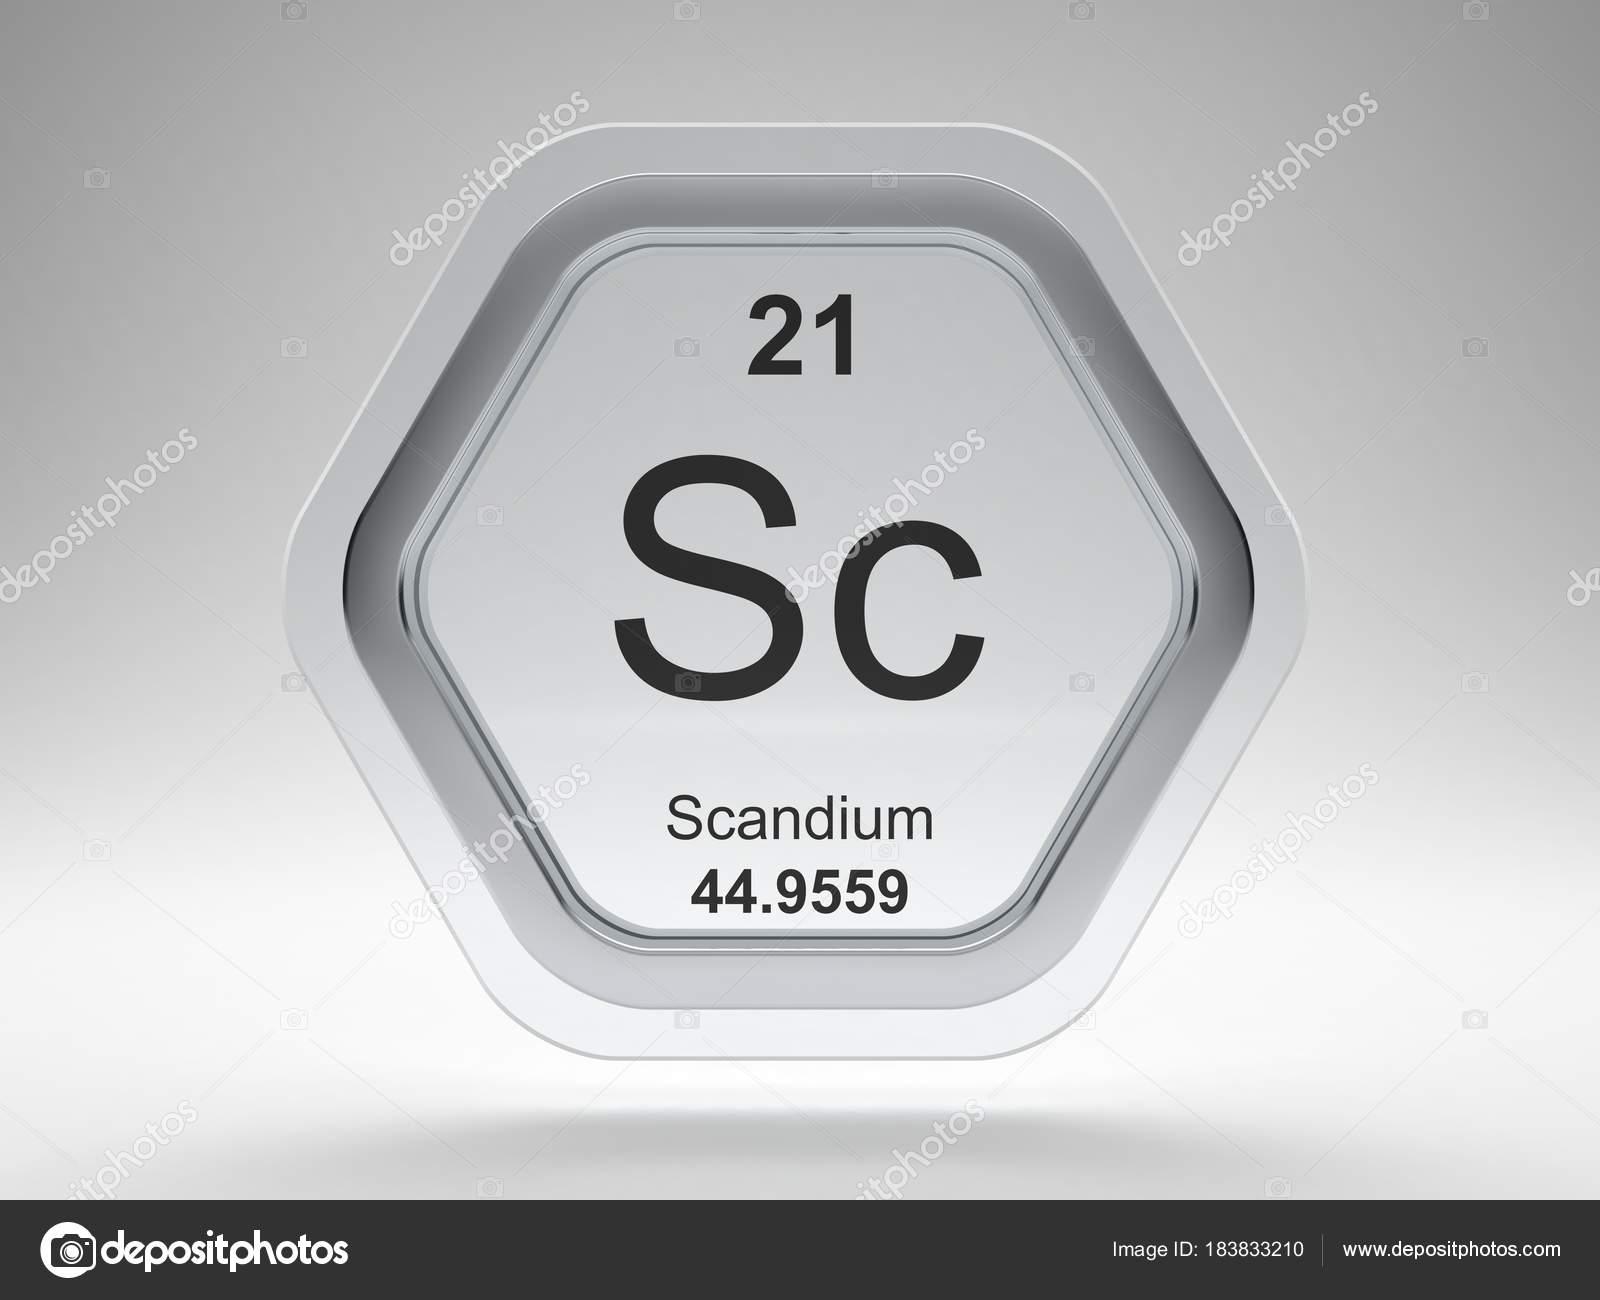 scandium symbol periodic table modern glass steel icon stock photo - Periodic Table Steel Symbol